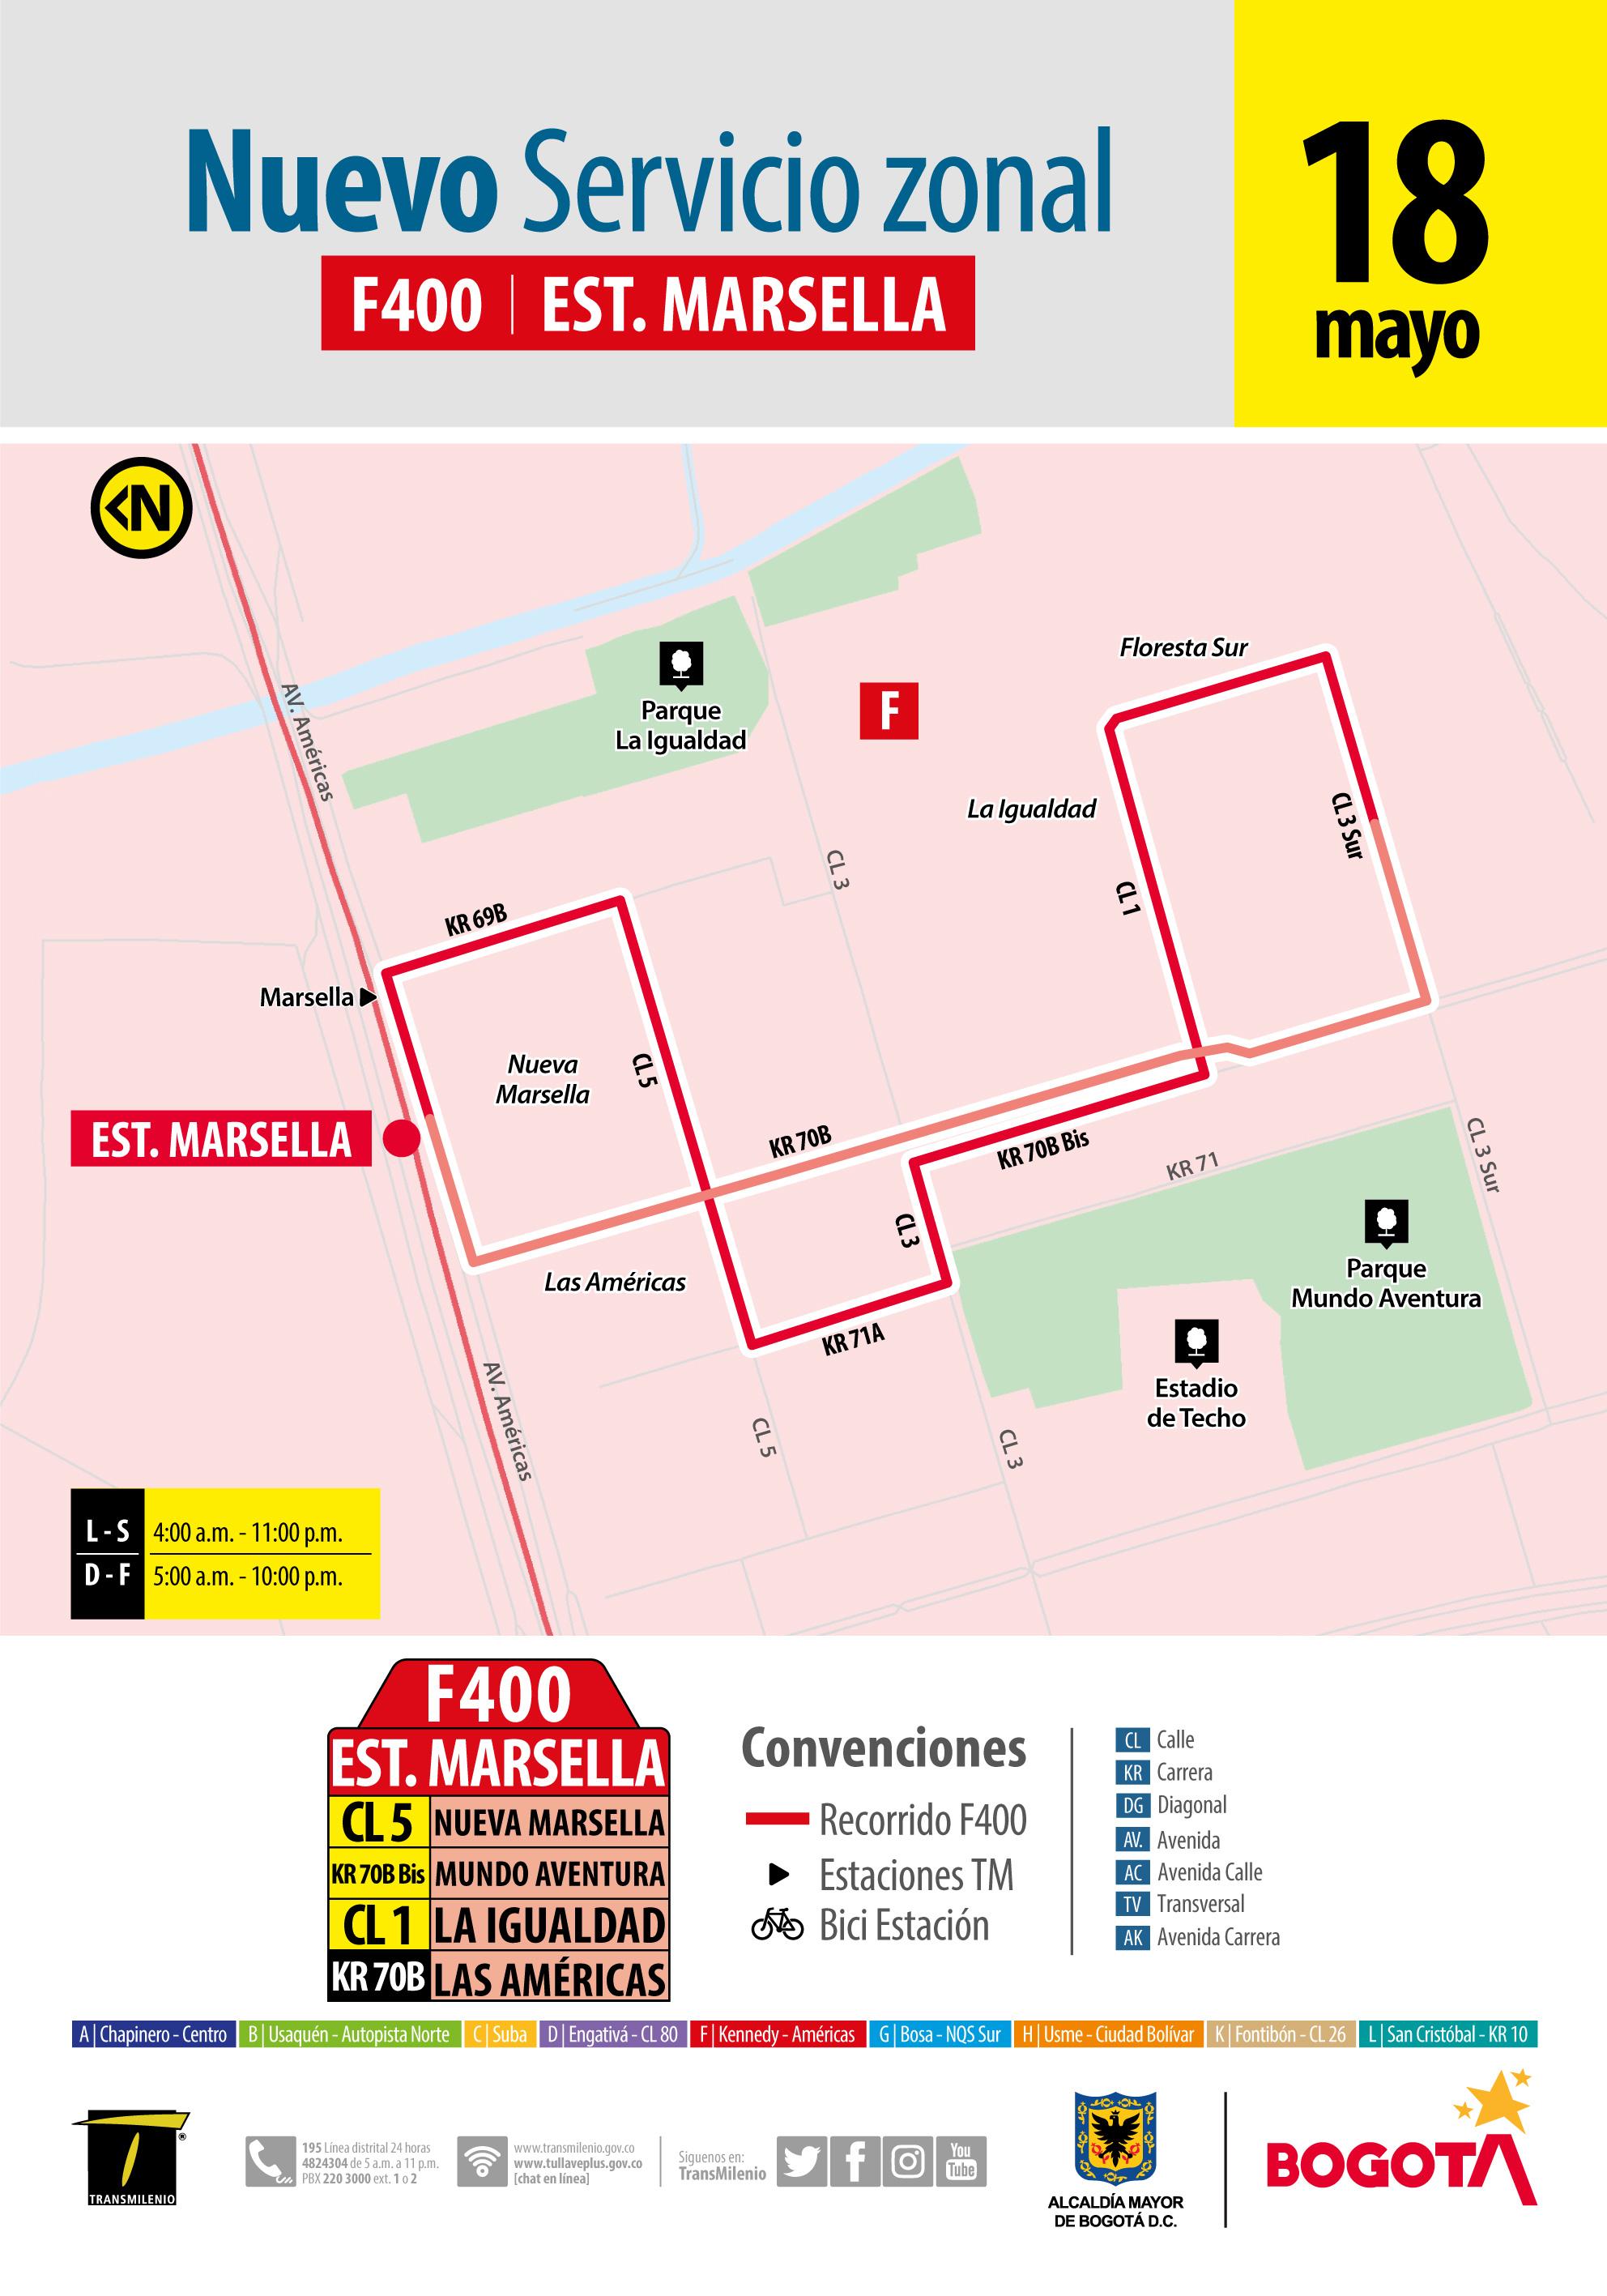 Mapa de la ruta F400